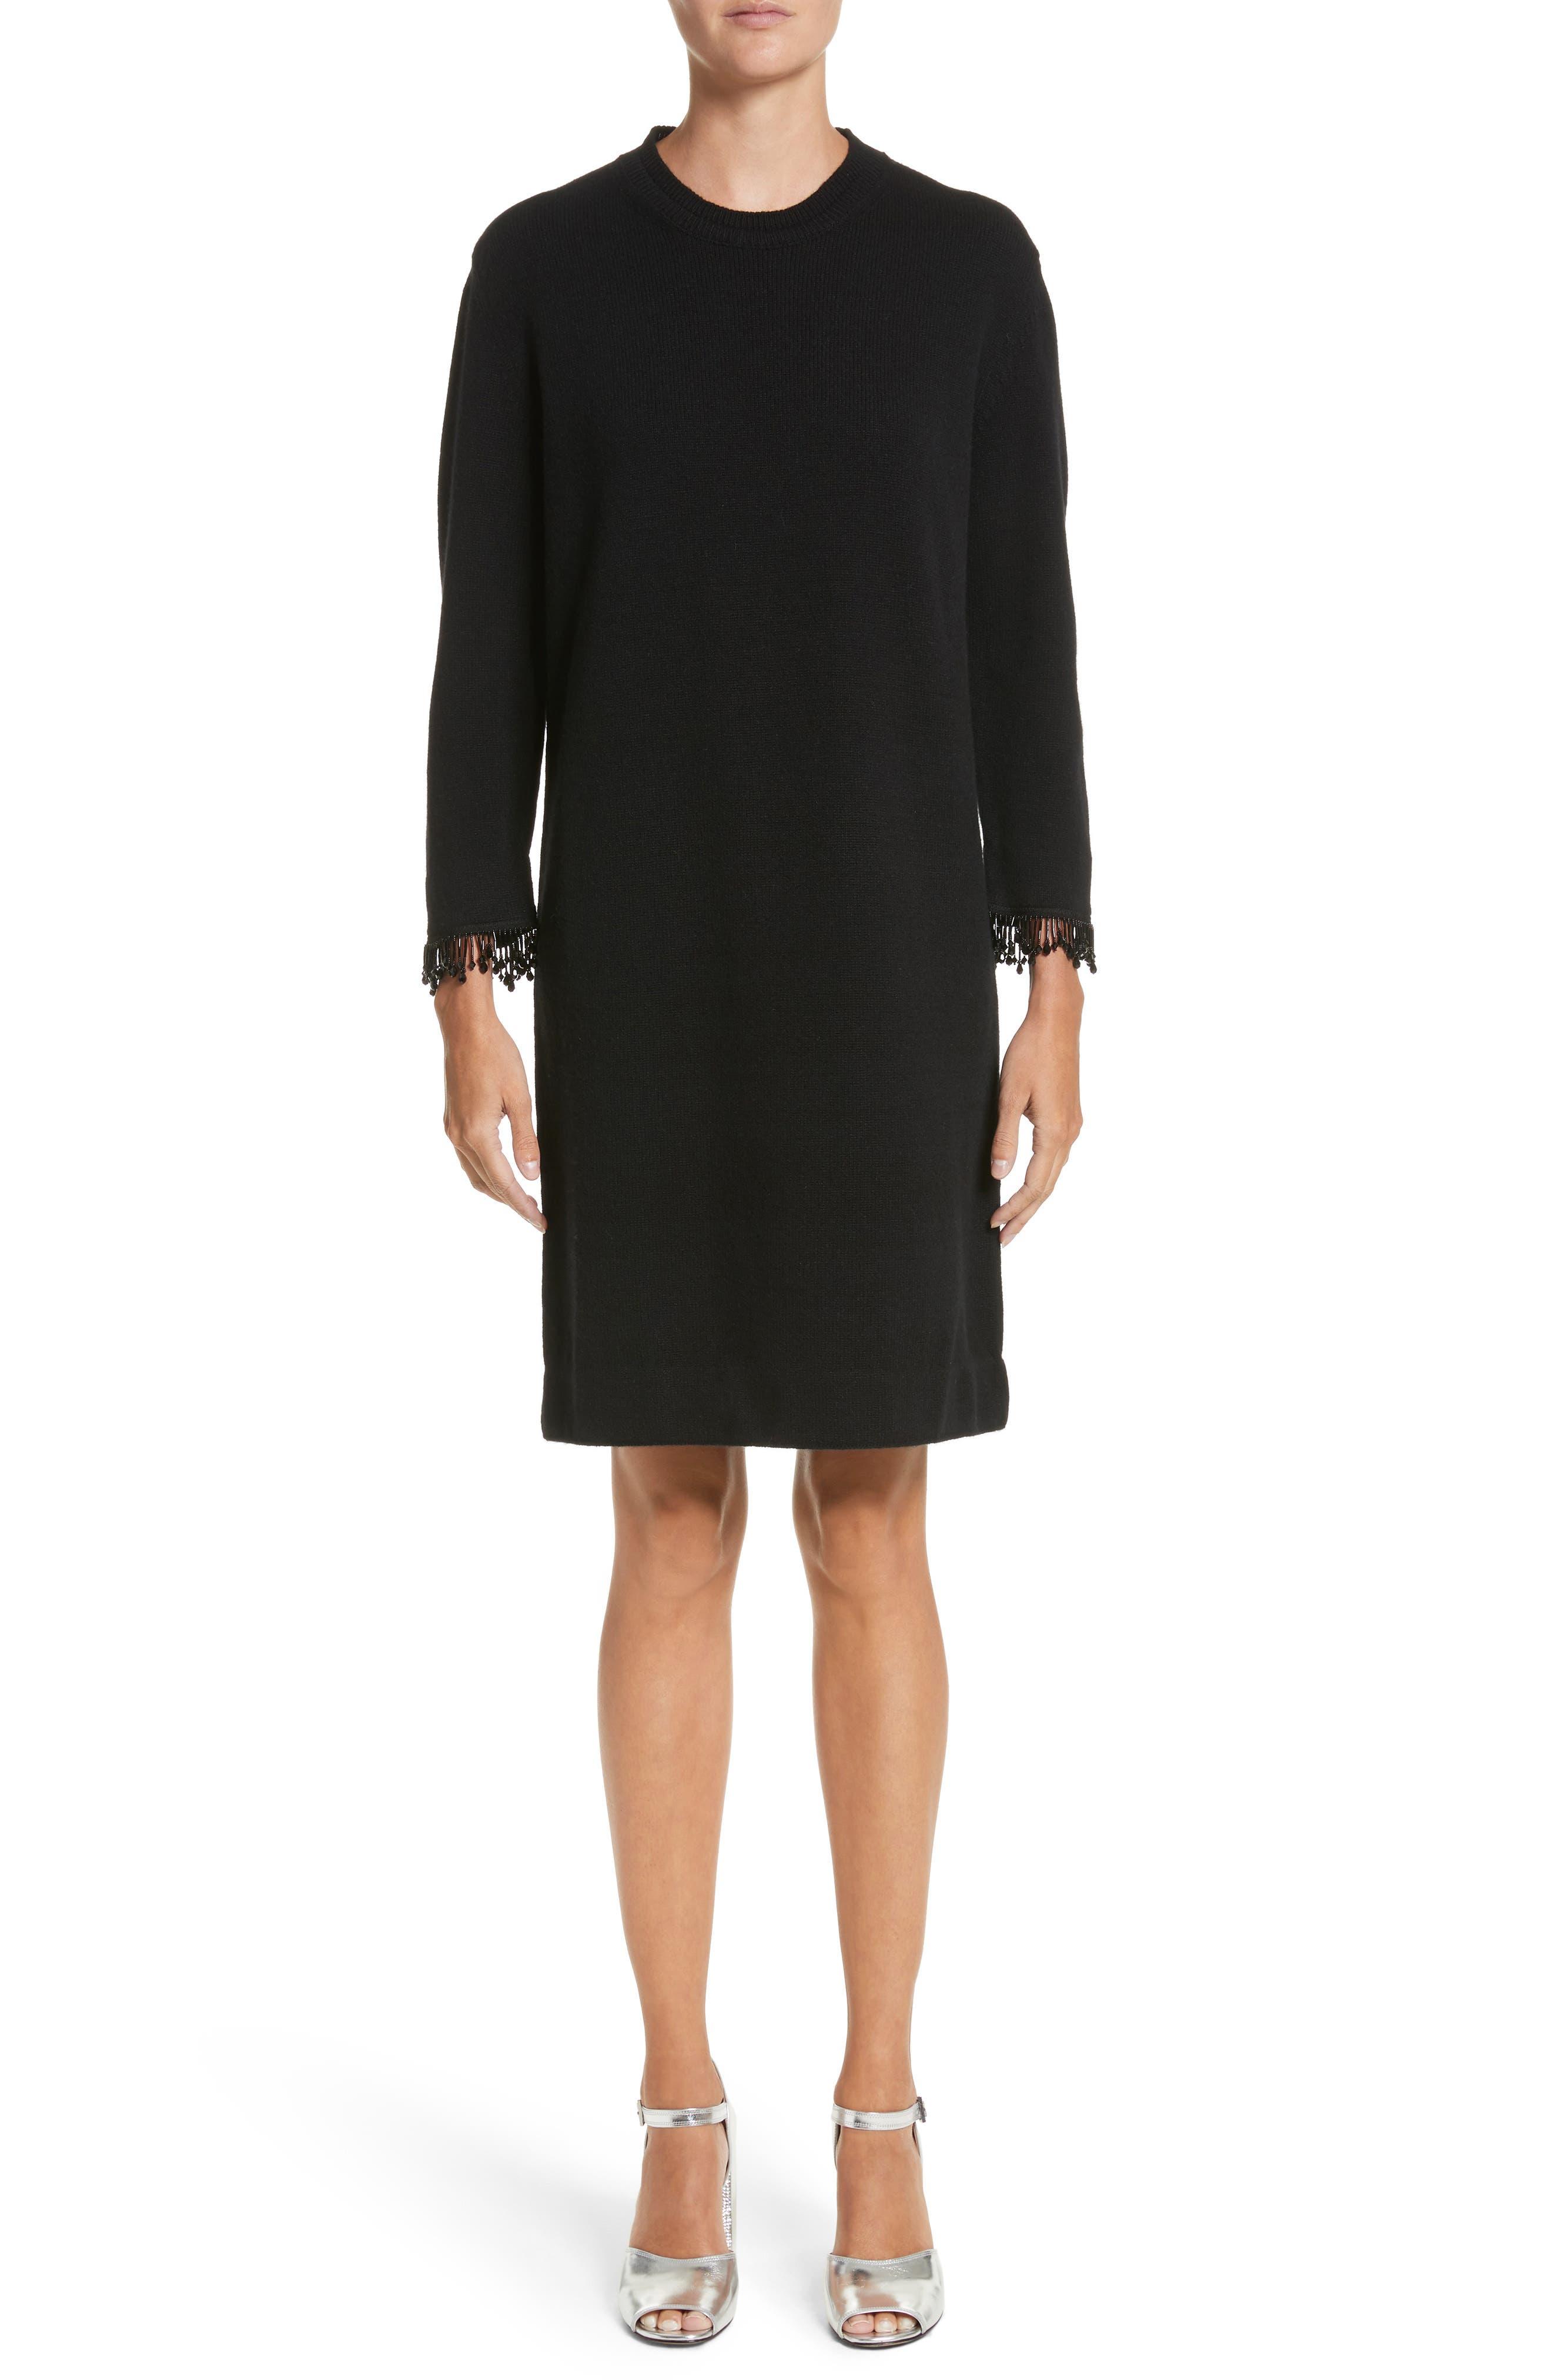 Alternate Image 1 Selected - MARC JACOBS Beaded Fringe Wool & Cashmere Dress